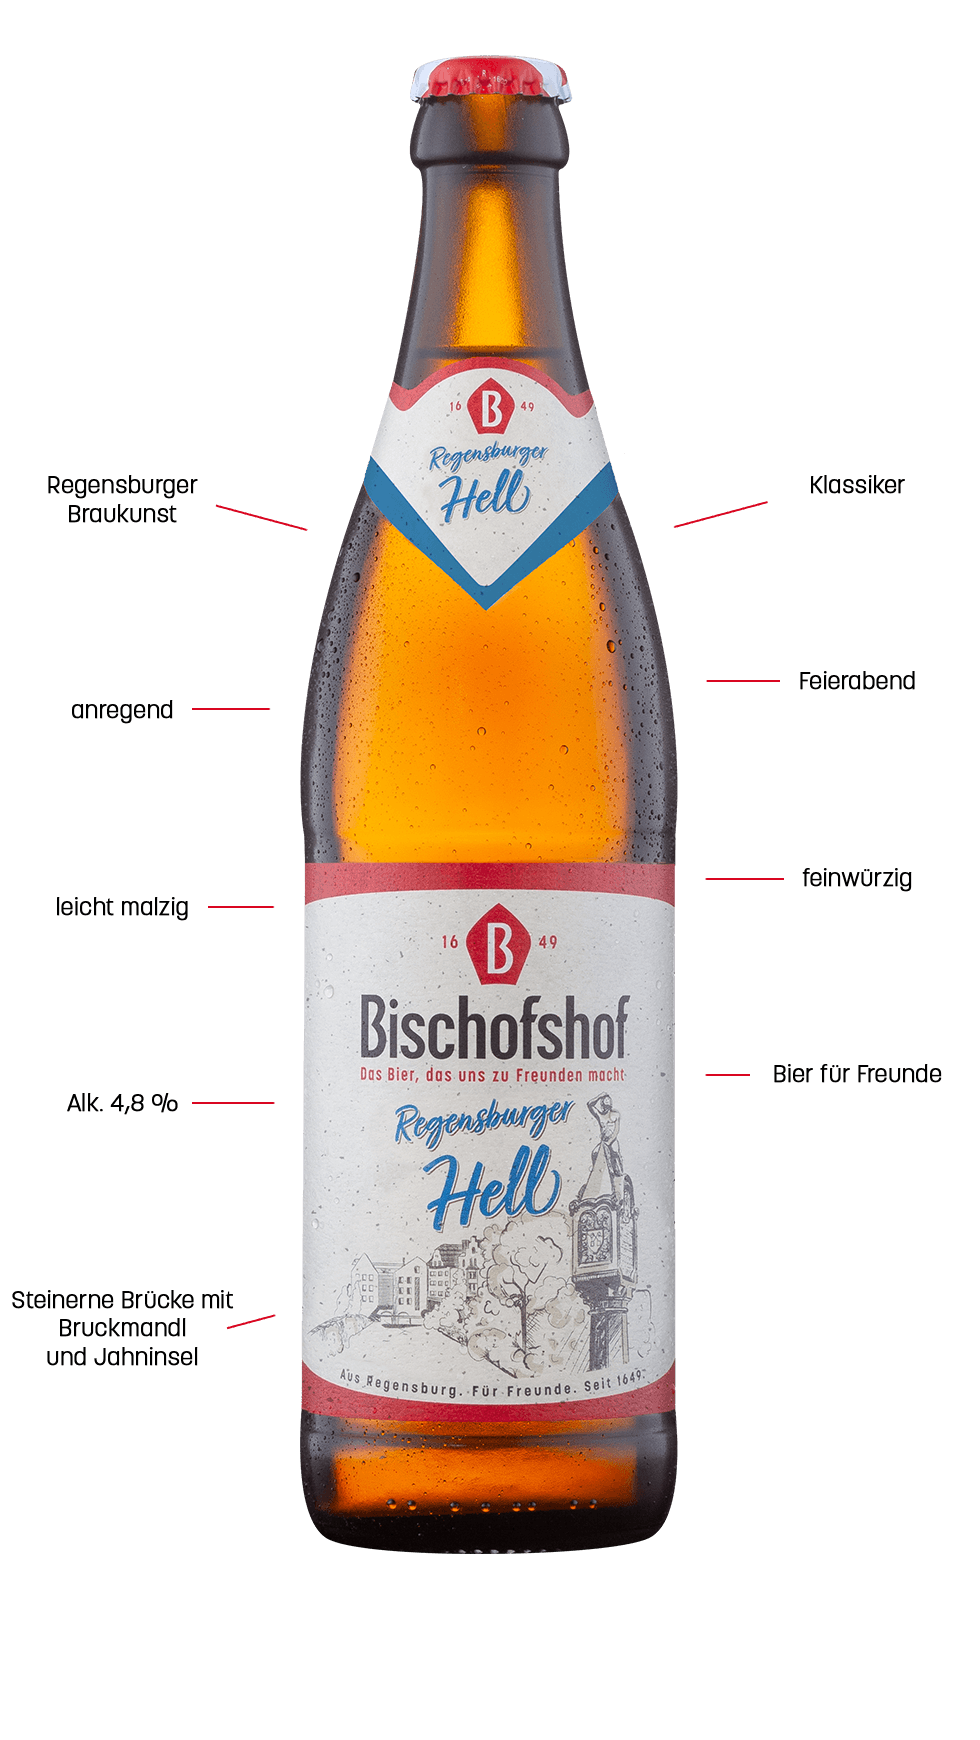 Bischofshof-Regensburger-Hell-0-5l_ManhartMedia_Schlagwoerter_02